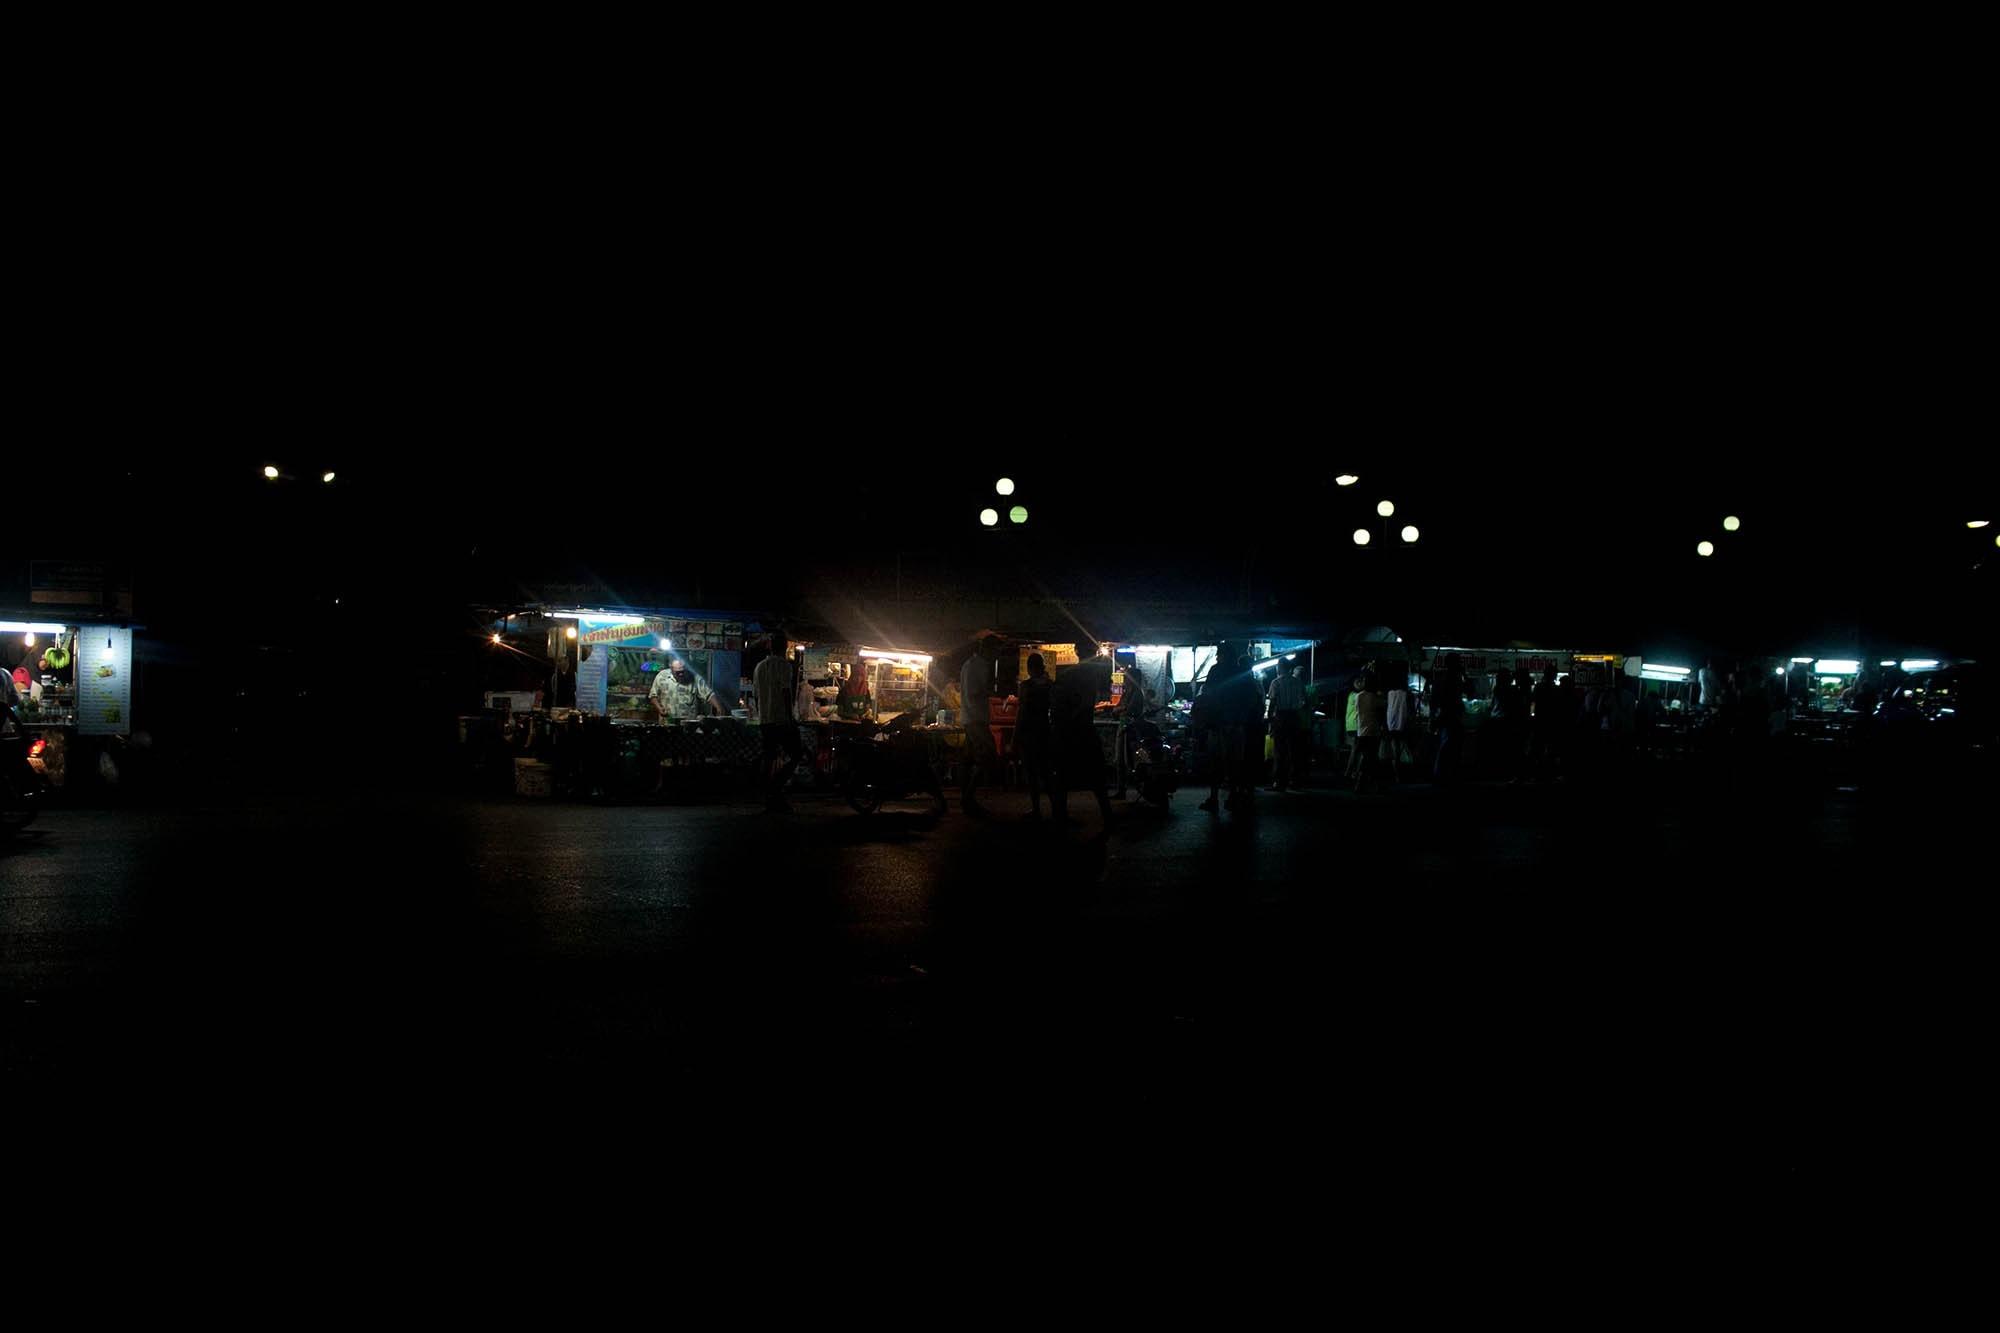 JUST LET THINGS HAPPEN -- Night market in Krabi, Thailand